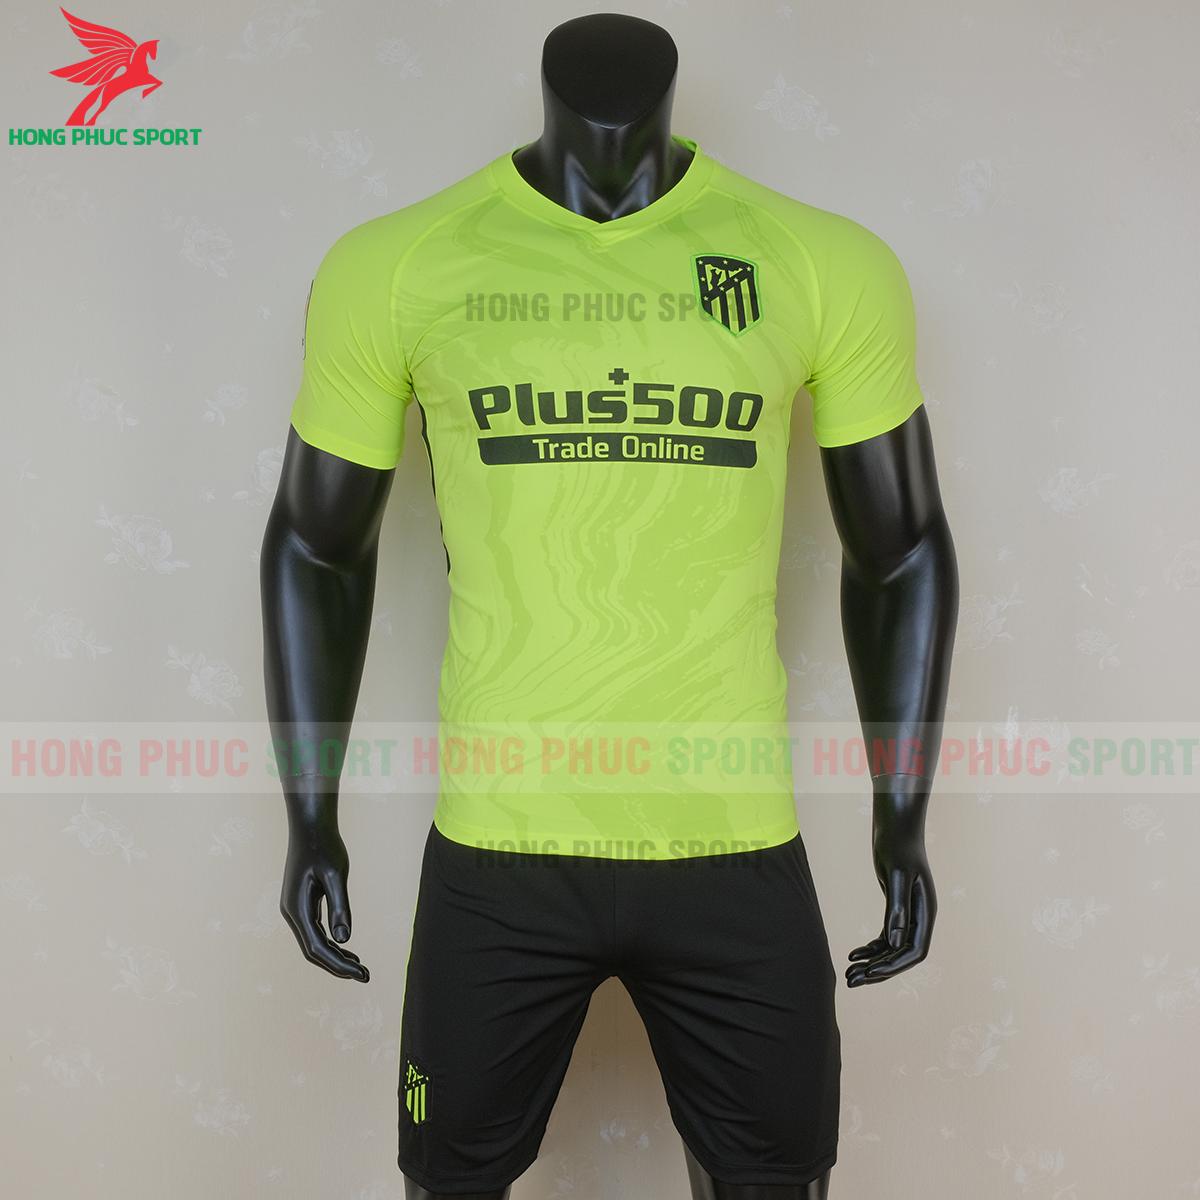 https://cdn.hongphucsport.com/unsafe/s4.shopbay.vn/files/285/ao-atletico-madrid-2020-2021-mau-thu-3-6-5f6d4a9ec130a.png